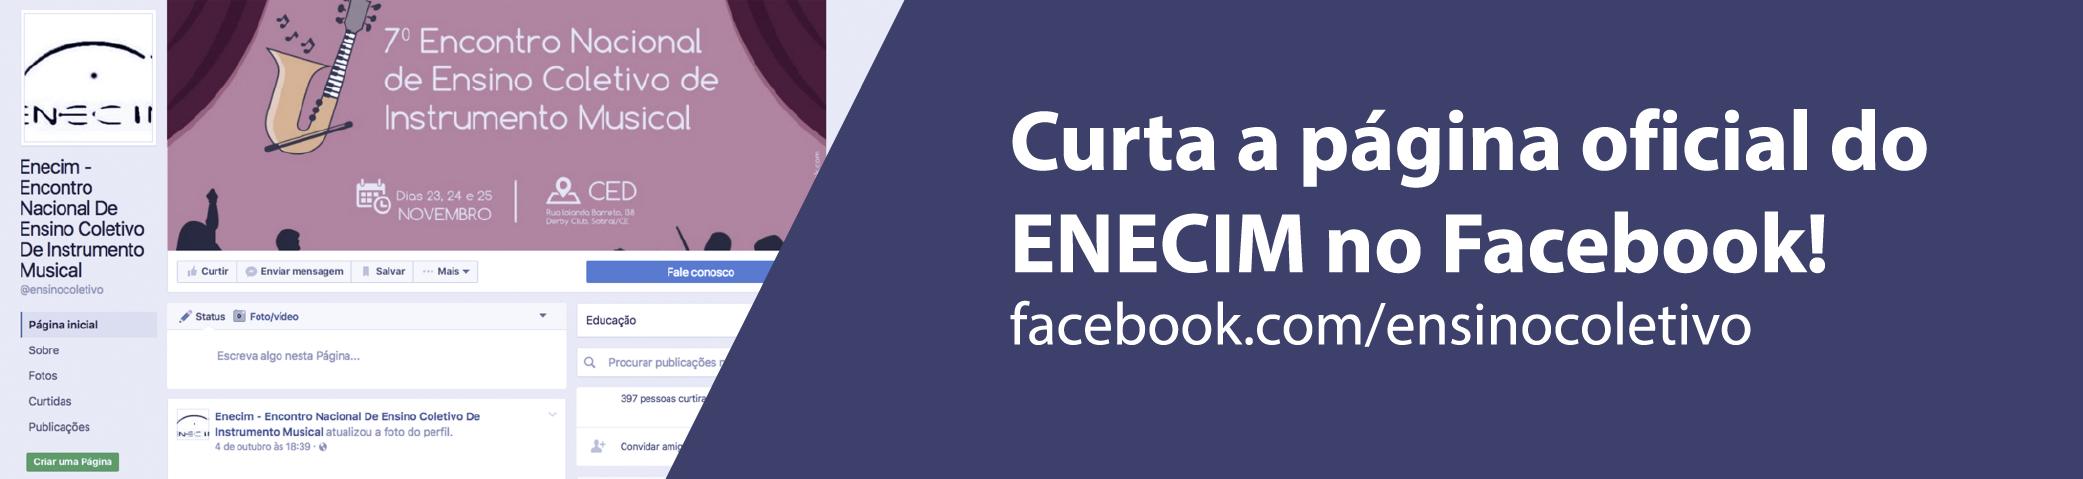 ENECIN - Facebook